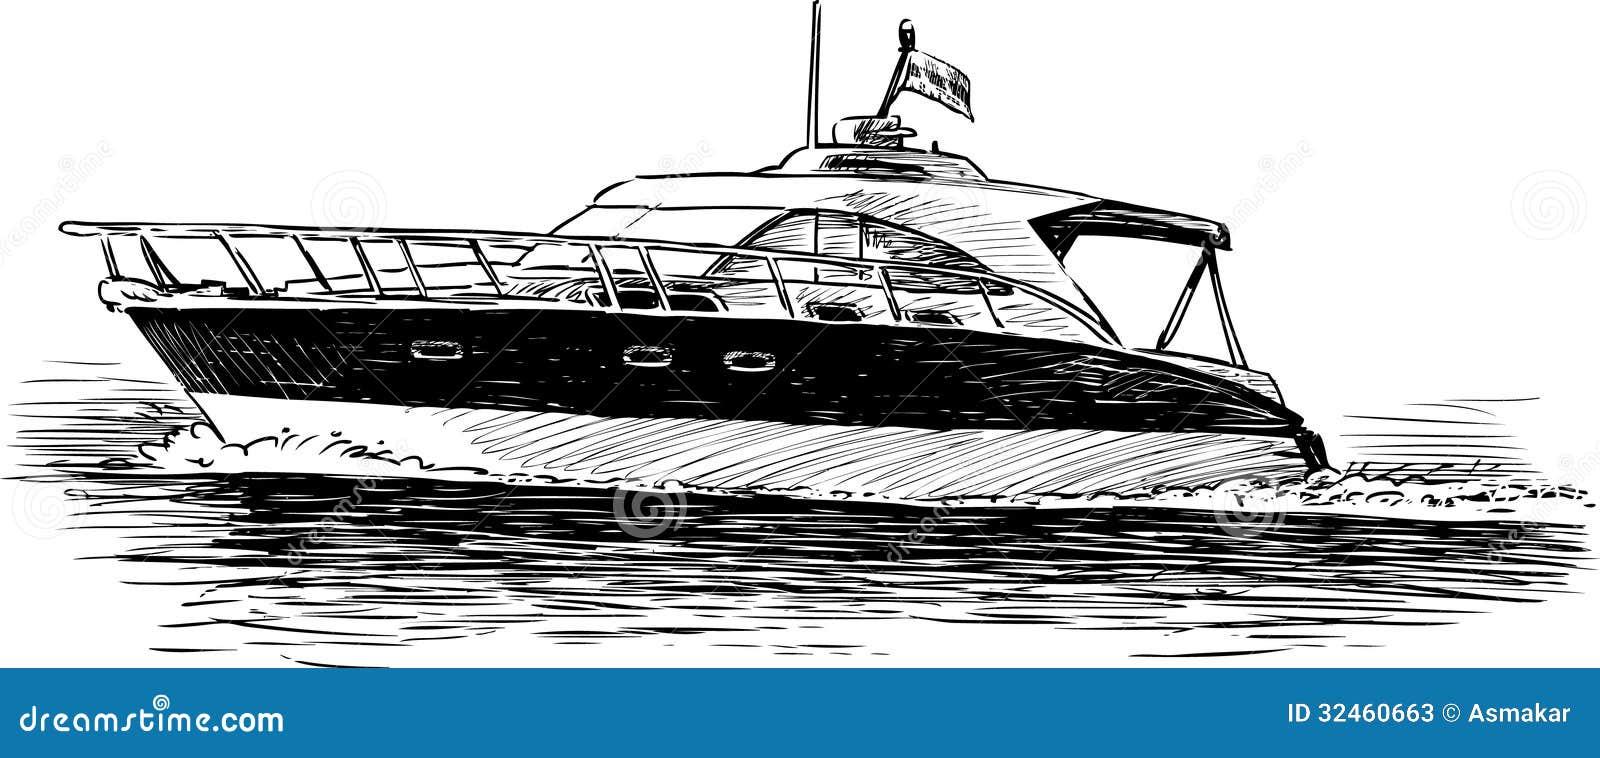 Pleasure Boat Stock Photos - Image: 32460663